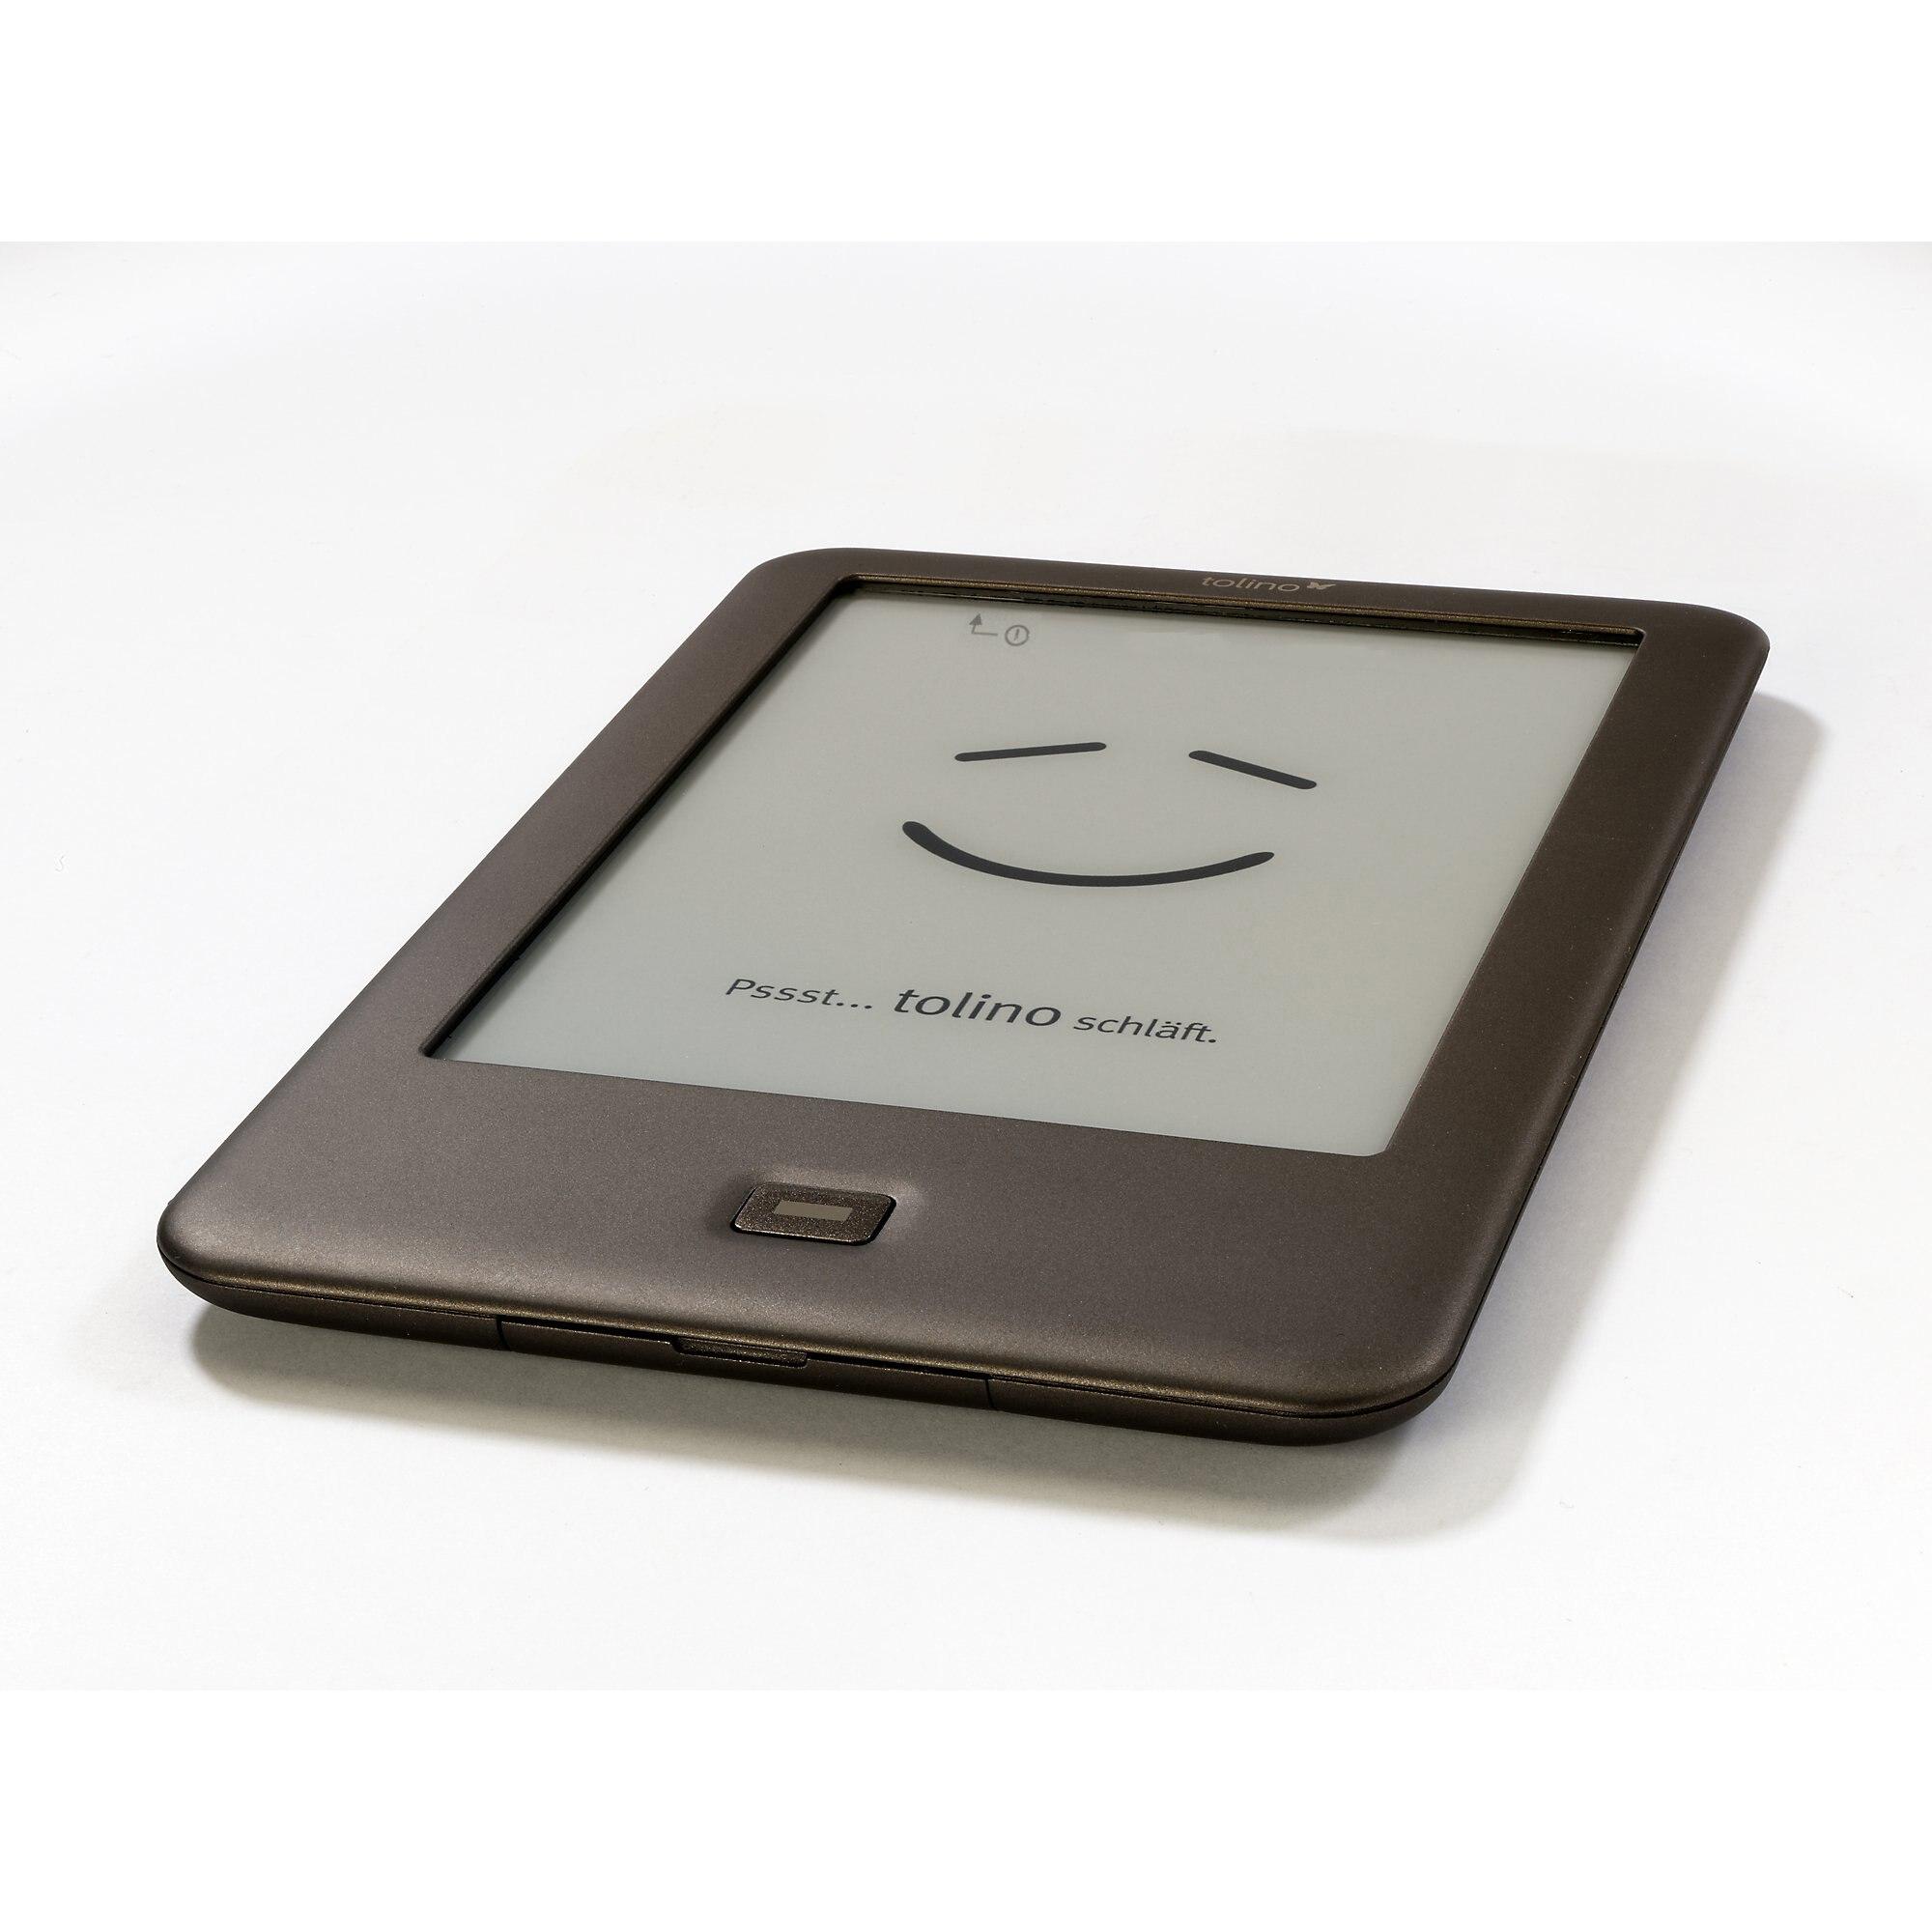 Image 5 - Built in Light e Book Reader WiFi ebook Tolino Shine e ink 6 inch  Touch Screen 1024x758 electronic Book ReadereBook Reader   -